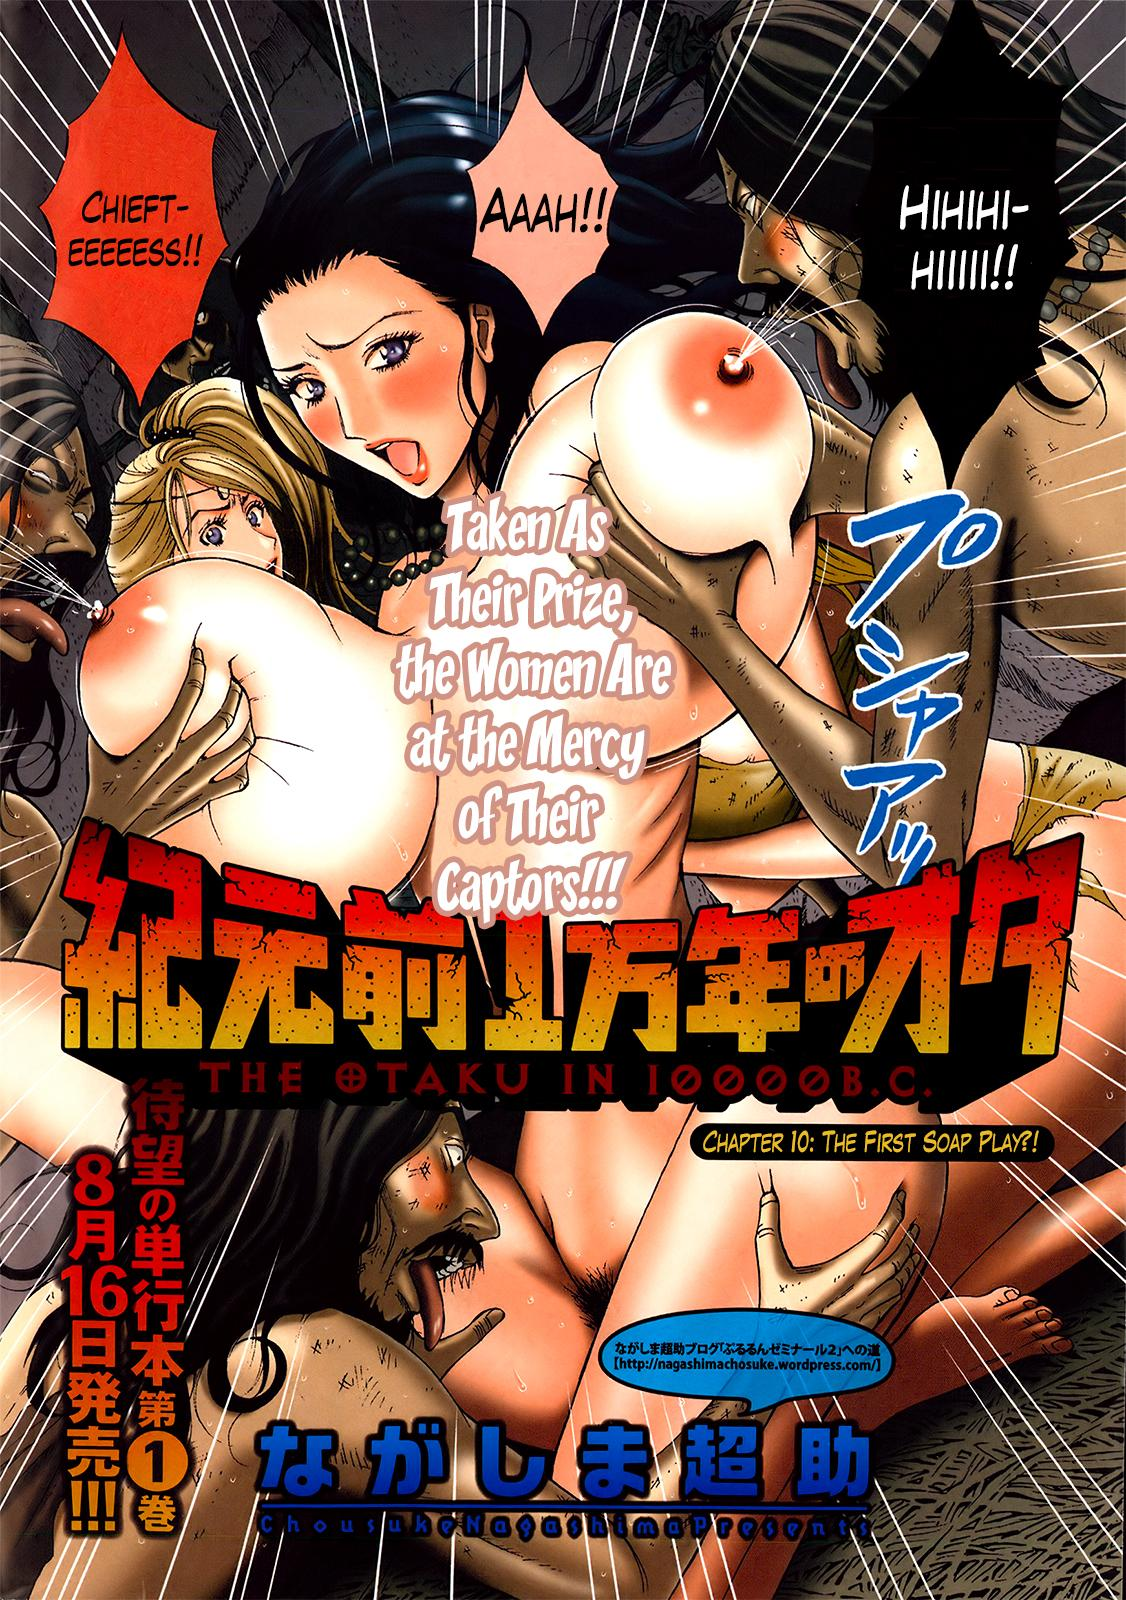 Kigenzen 10000 Nen no Ota   The Otaku in 10,000 B.C. Ch. 1-22 176